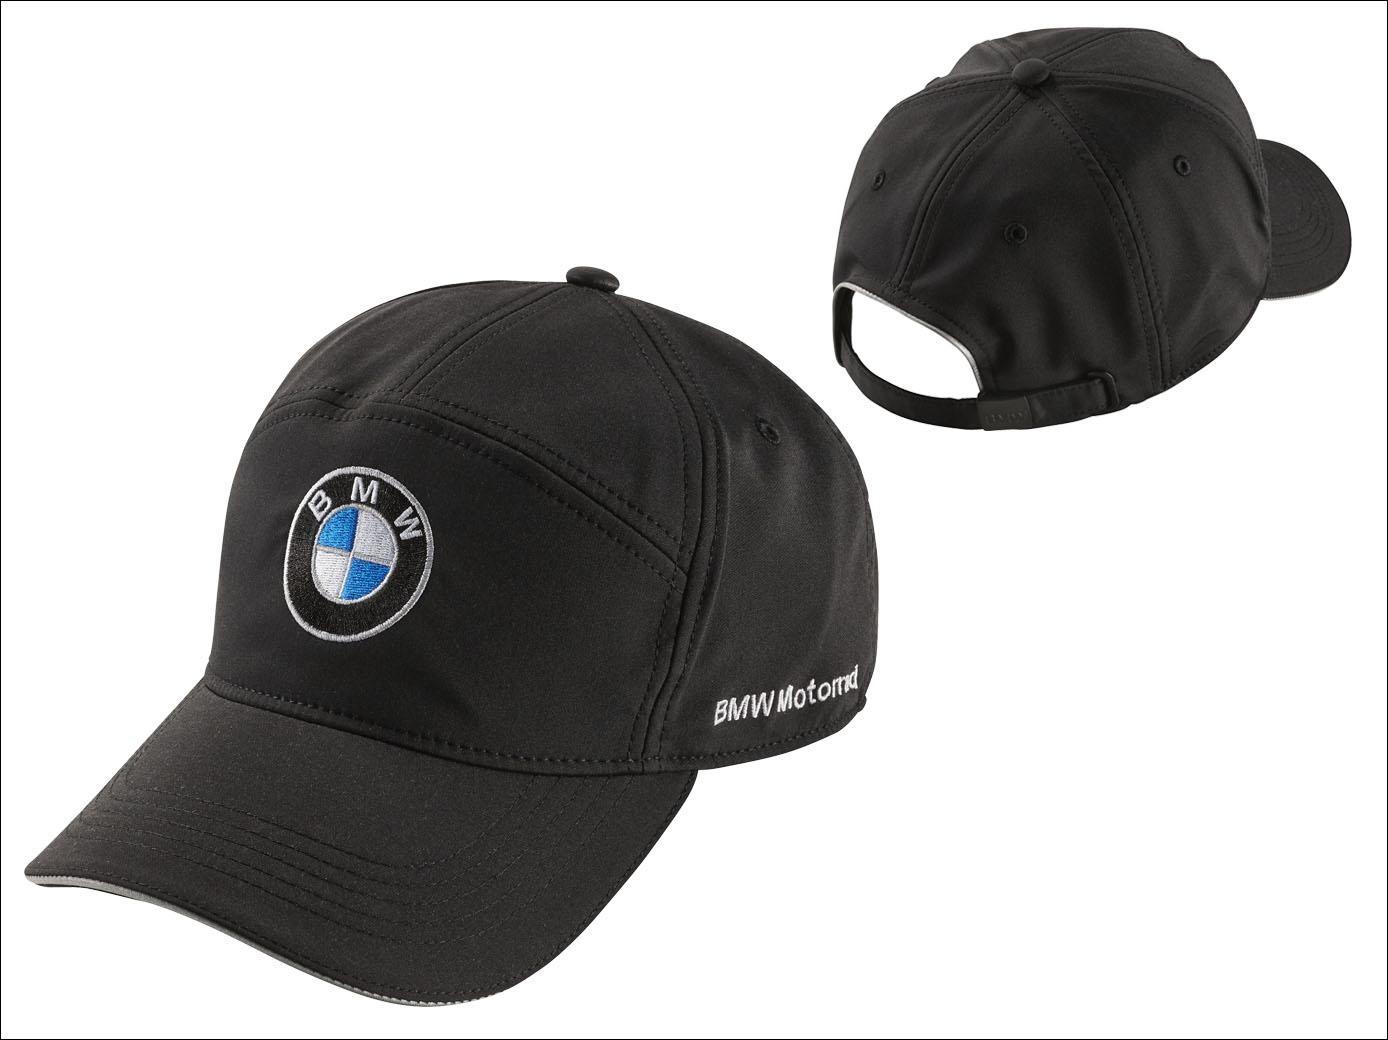 BMW Motorrad Logo Hat / Cap - Black - 76898352729